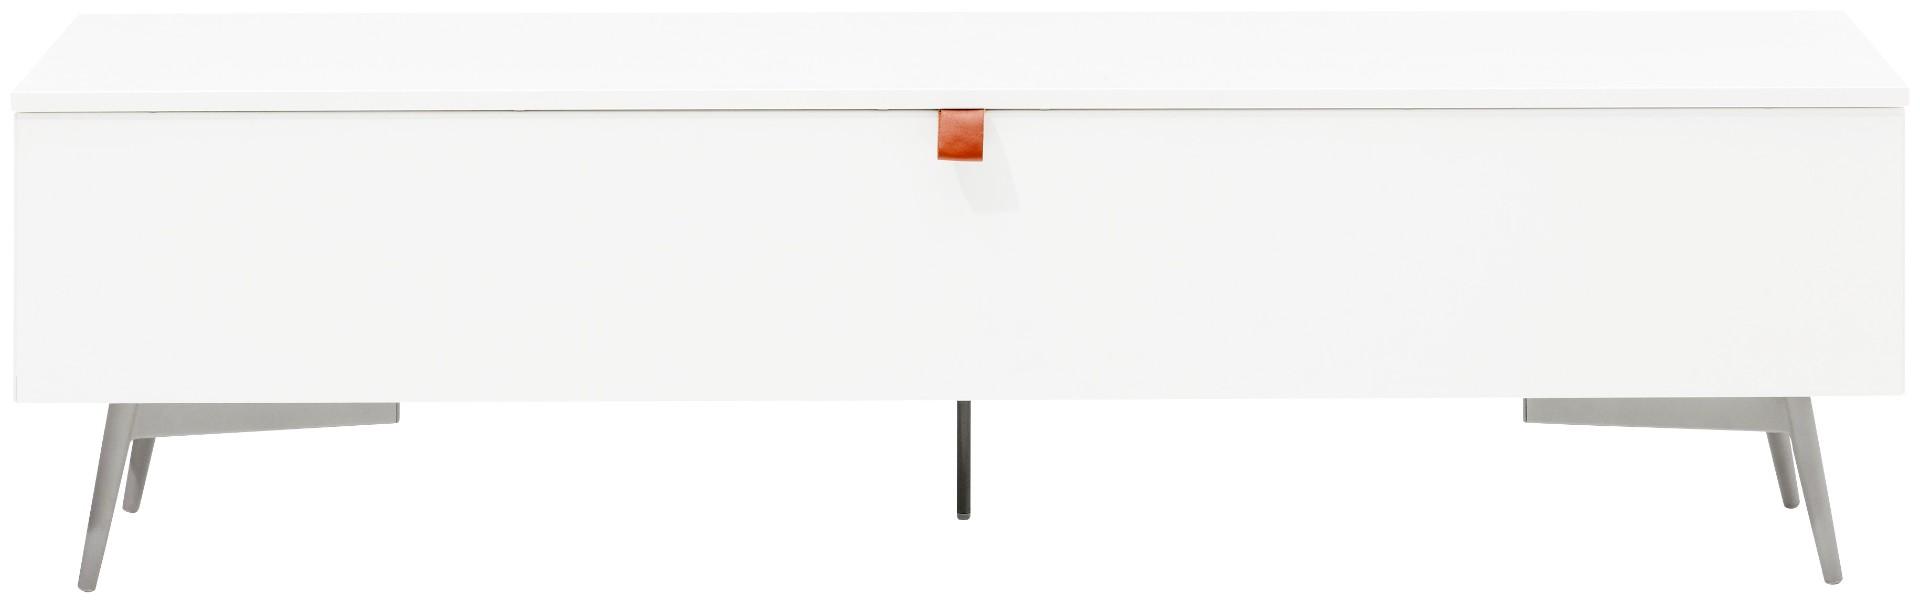 Lugano bench